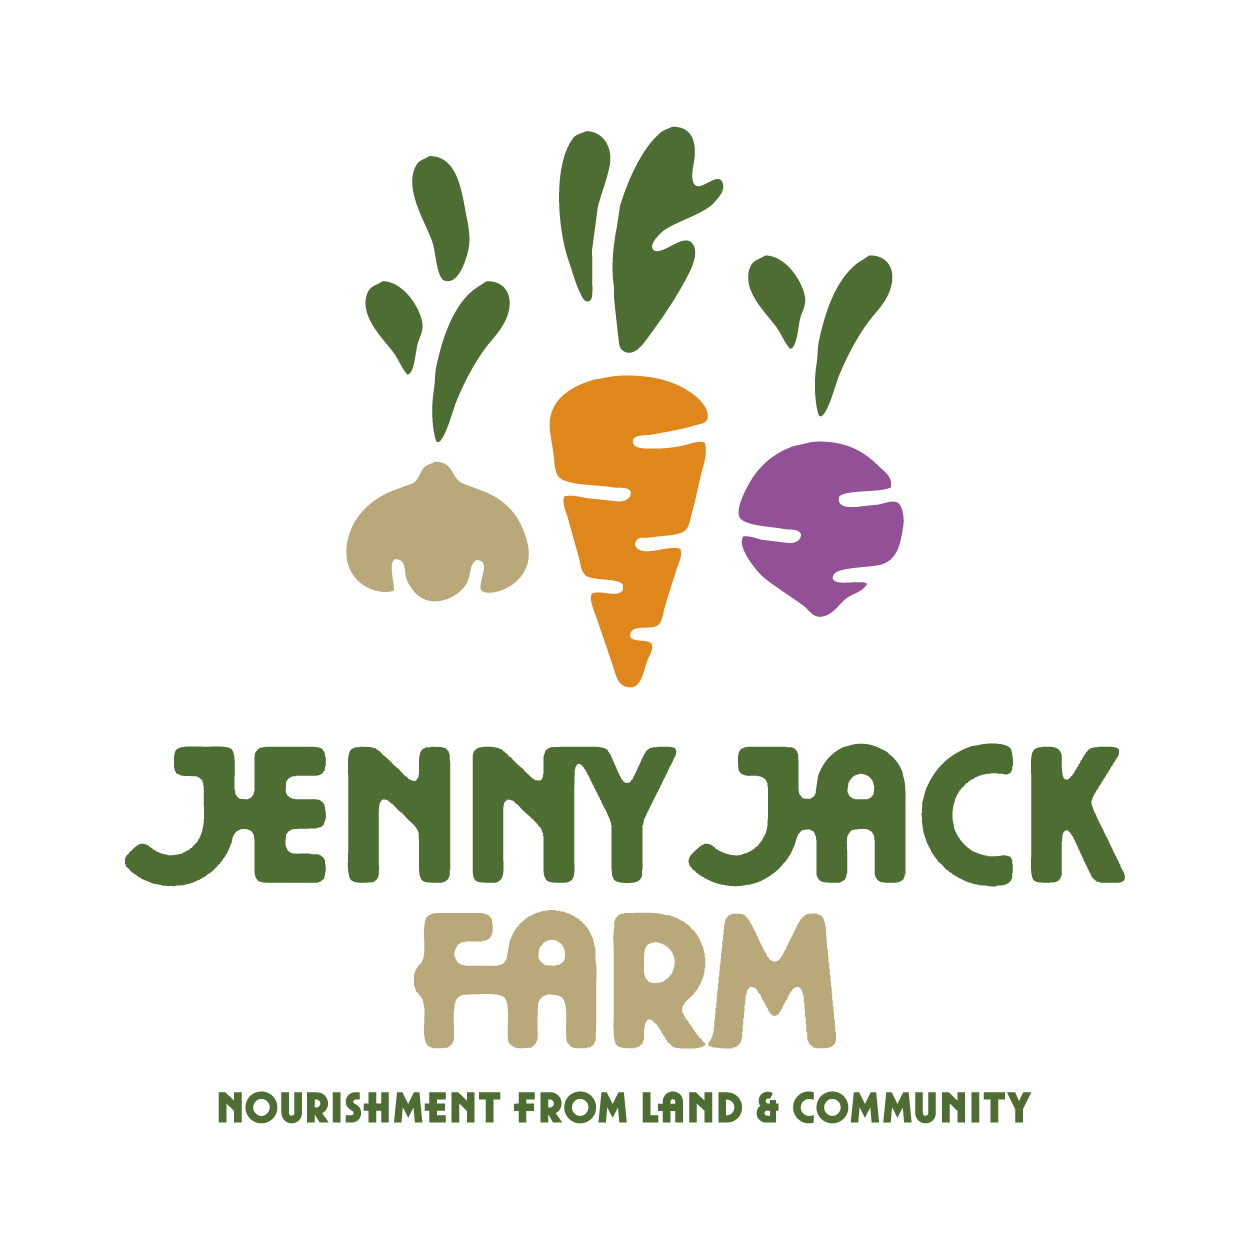 Jenny Jack Farm